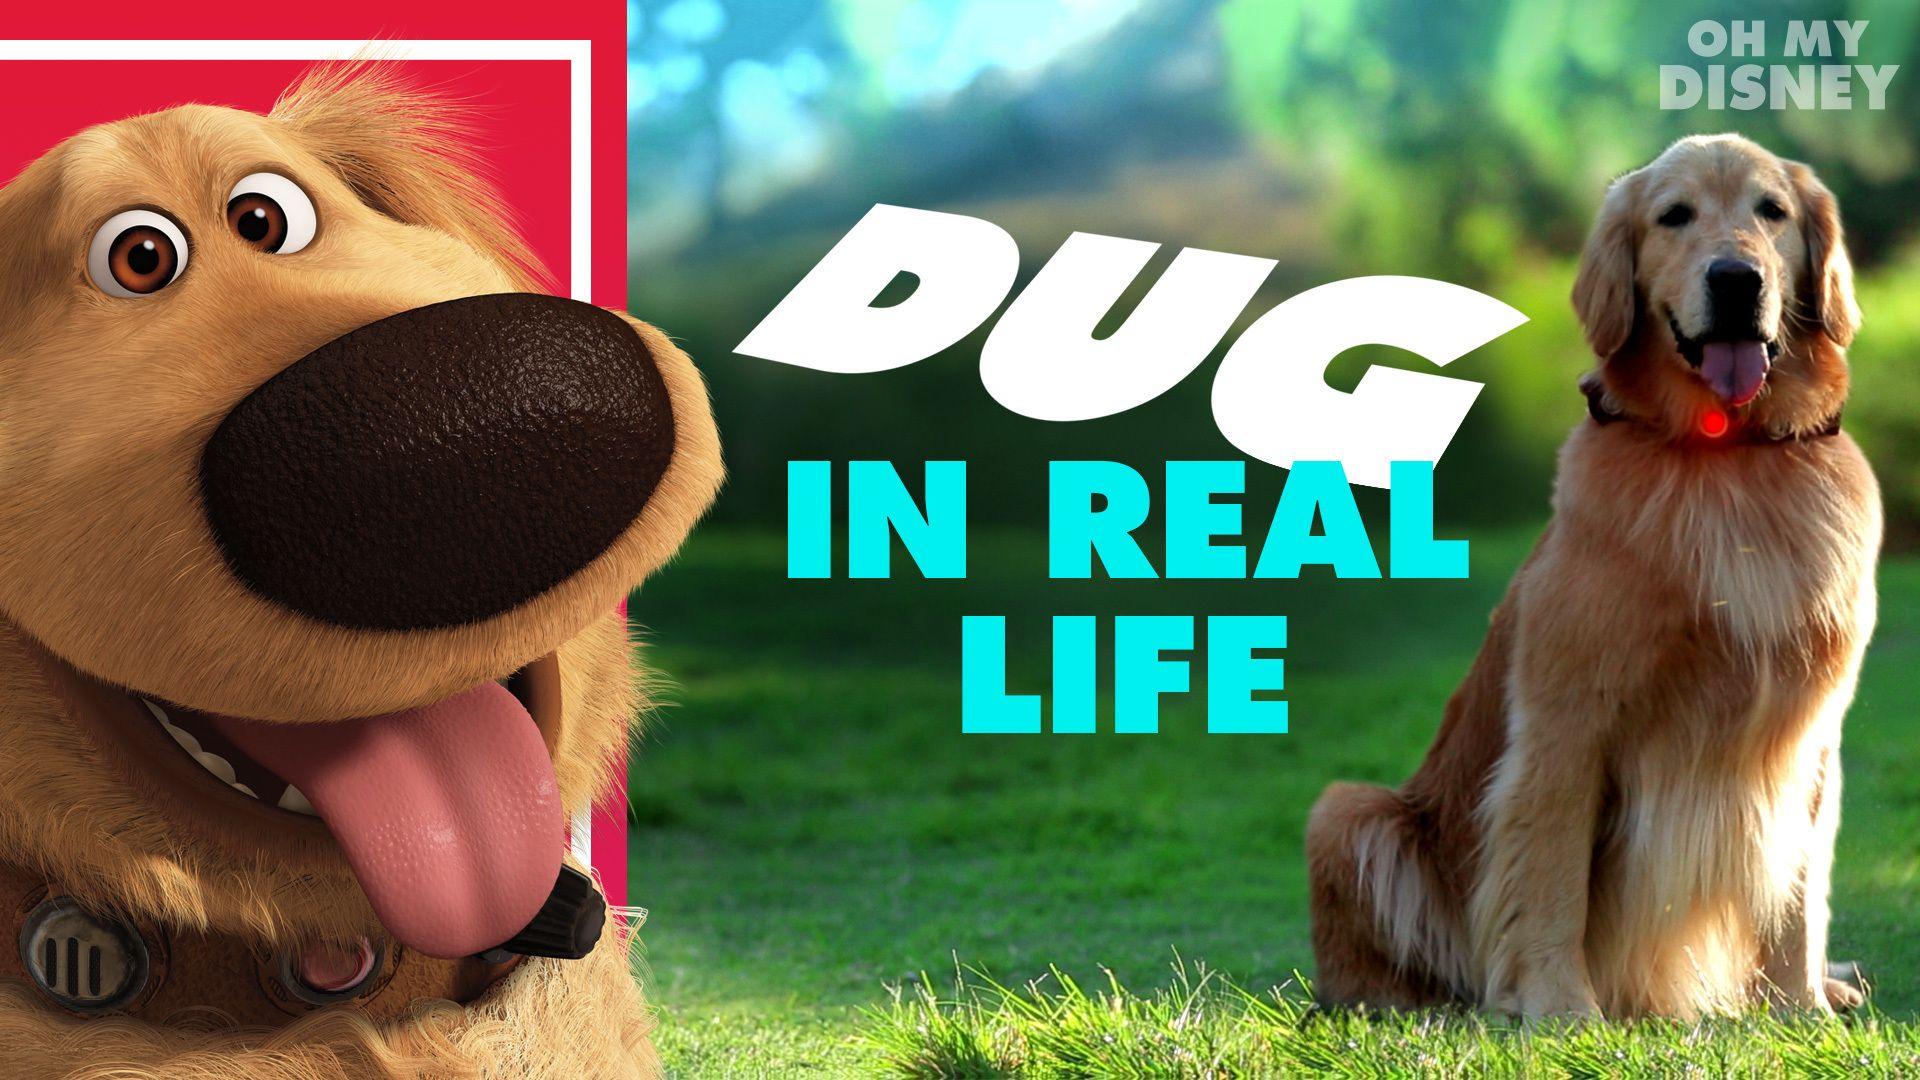 Disneypixars dug the talking dog in real life oh my